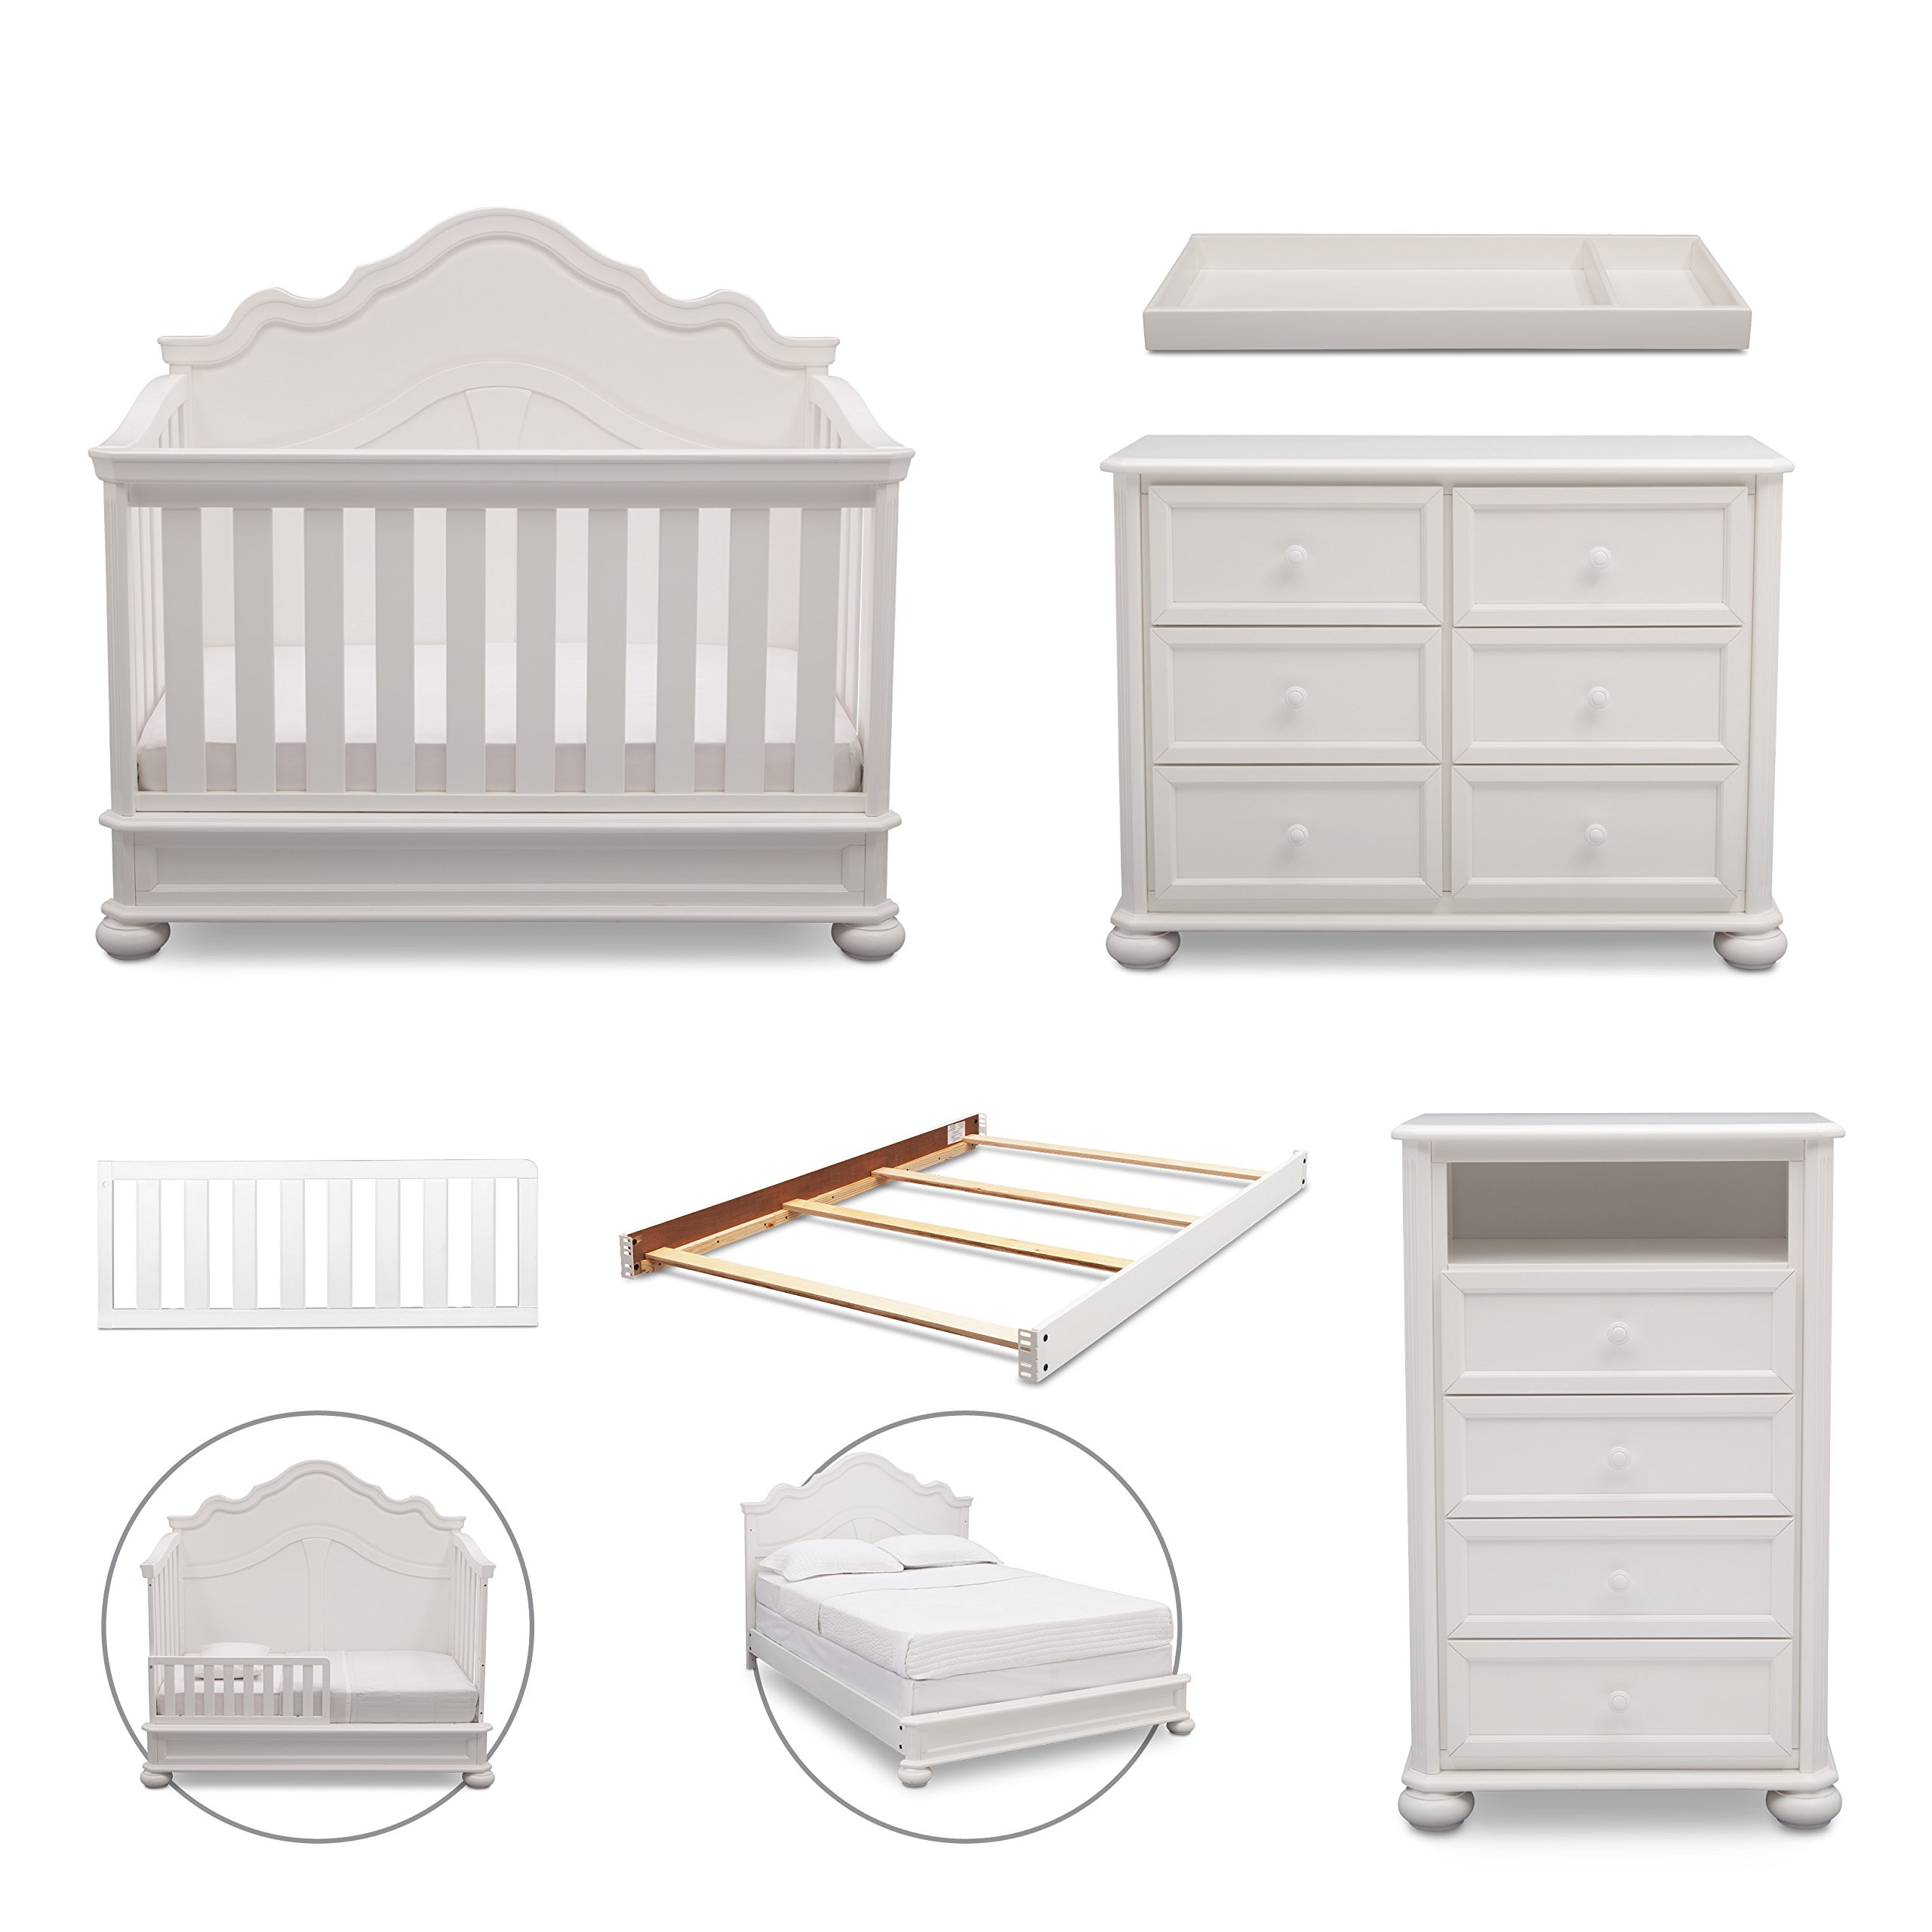 Simmons Kids Peyton 6-Piece Nursery Furniture Set (Convertible Crib, Dresser, Chest, Changing Top, Toddler Guardrail, Full Size Conversion), Bianca White by Delta Children (Image #1)